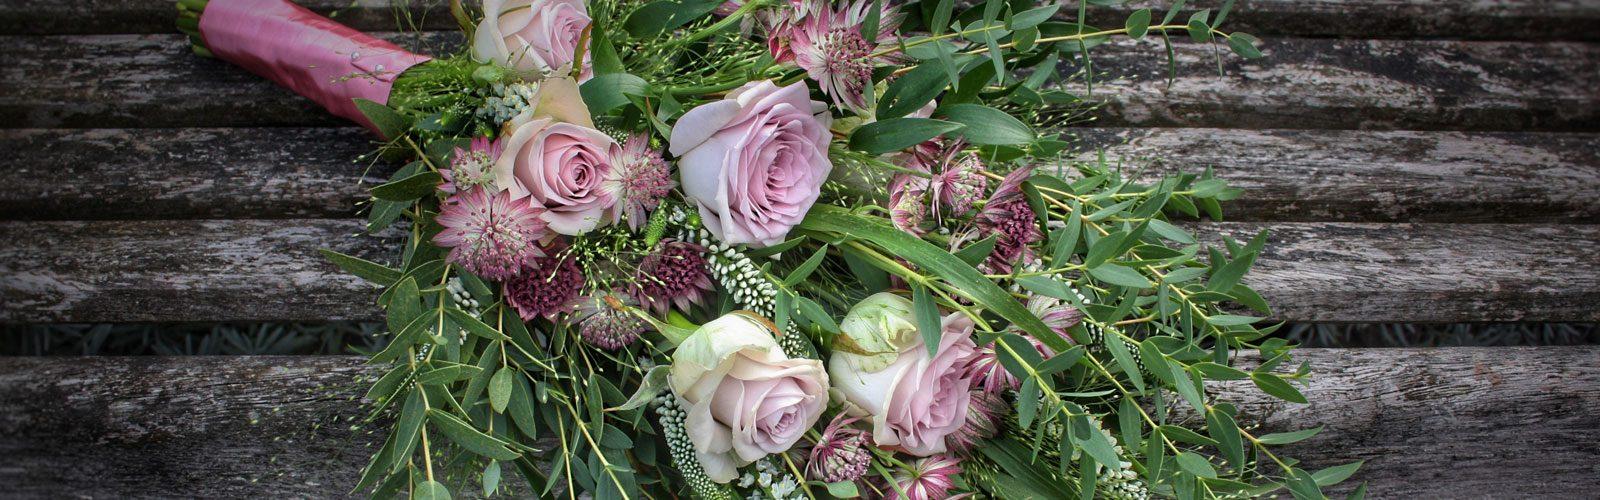 Wedding florist Petts Wood